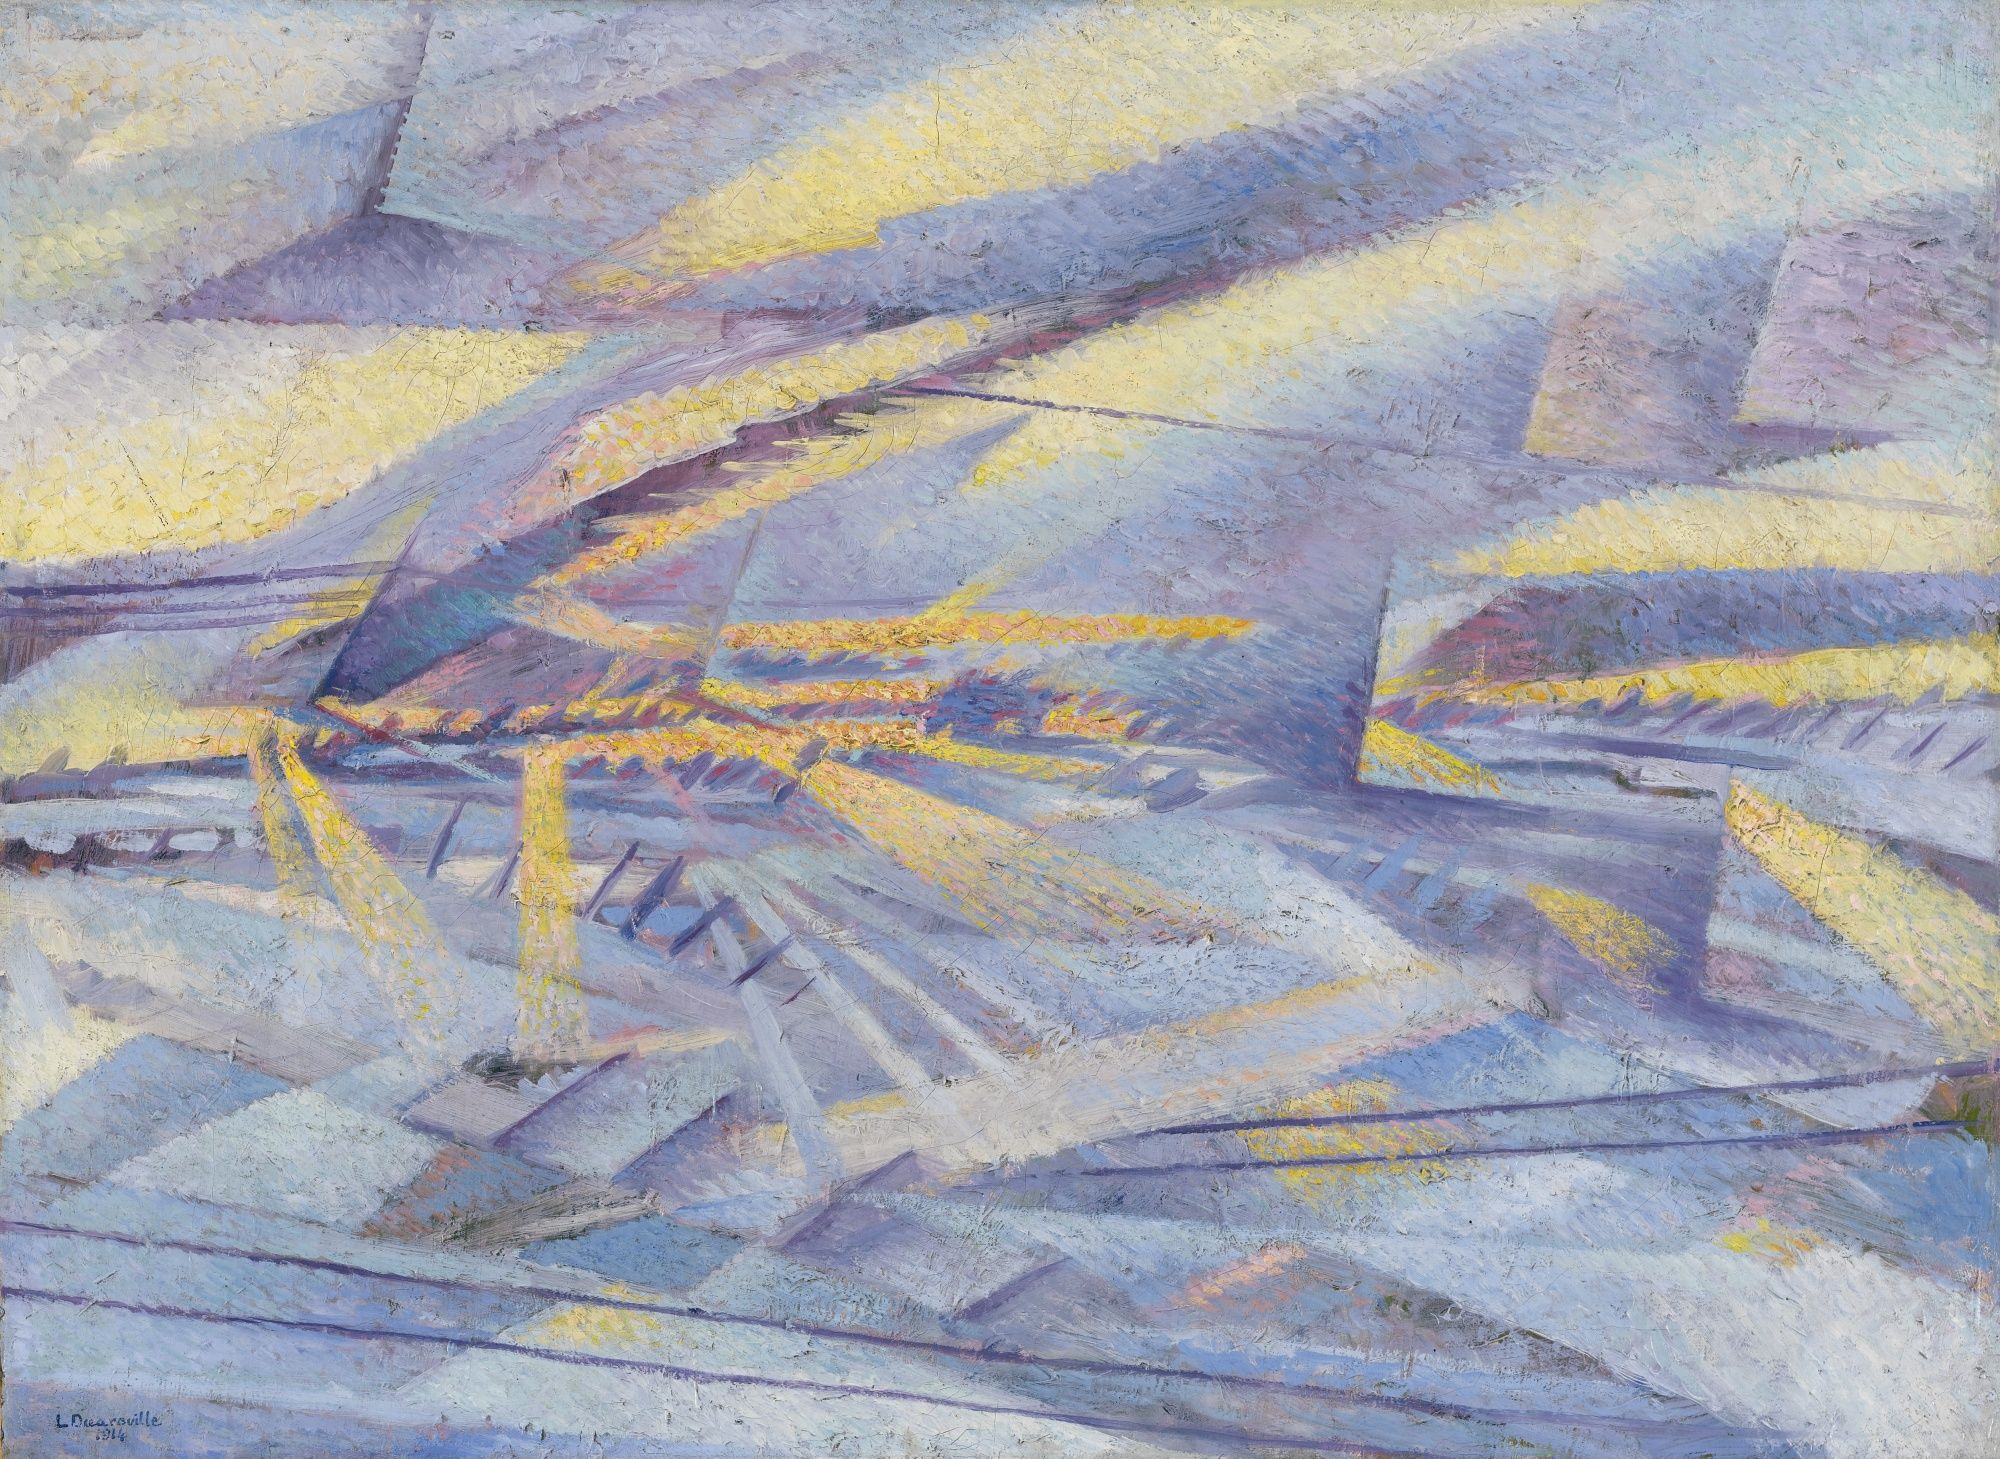 Leonardo Dudreville  1885 - 1975  TRAVERSANDO LA PIANURA PADANA SOTTO LA NEVE  SIGNED AND DATED 1914; SIGNED, TITLED AND DATED 1914 ON THE REVERSE, OIL ON CANVAS